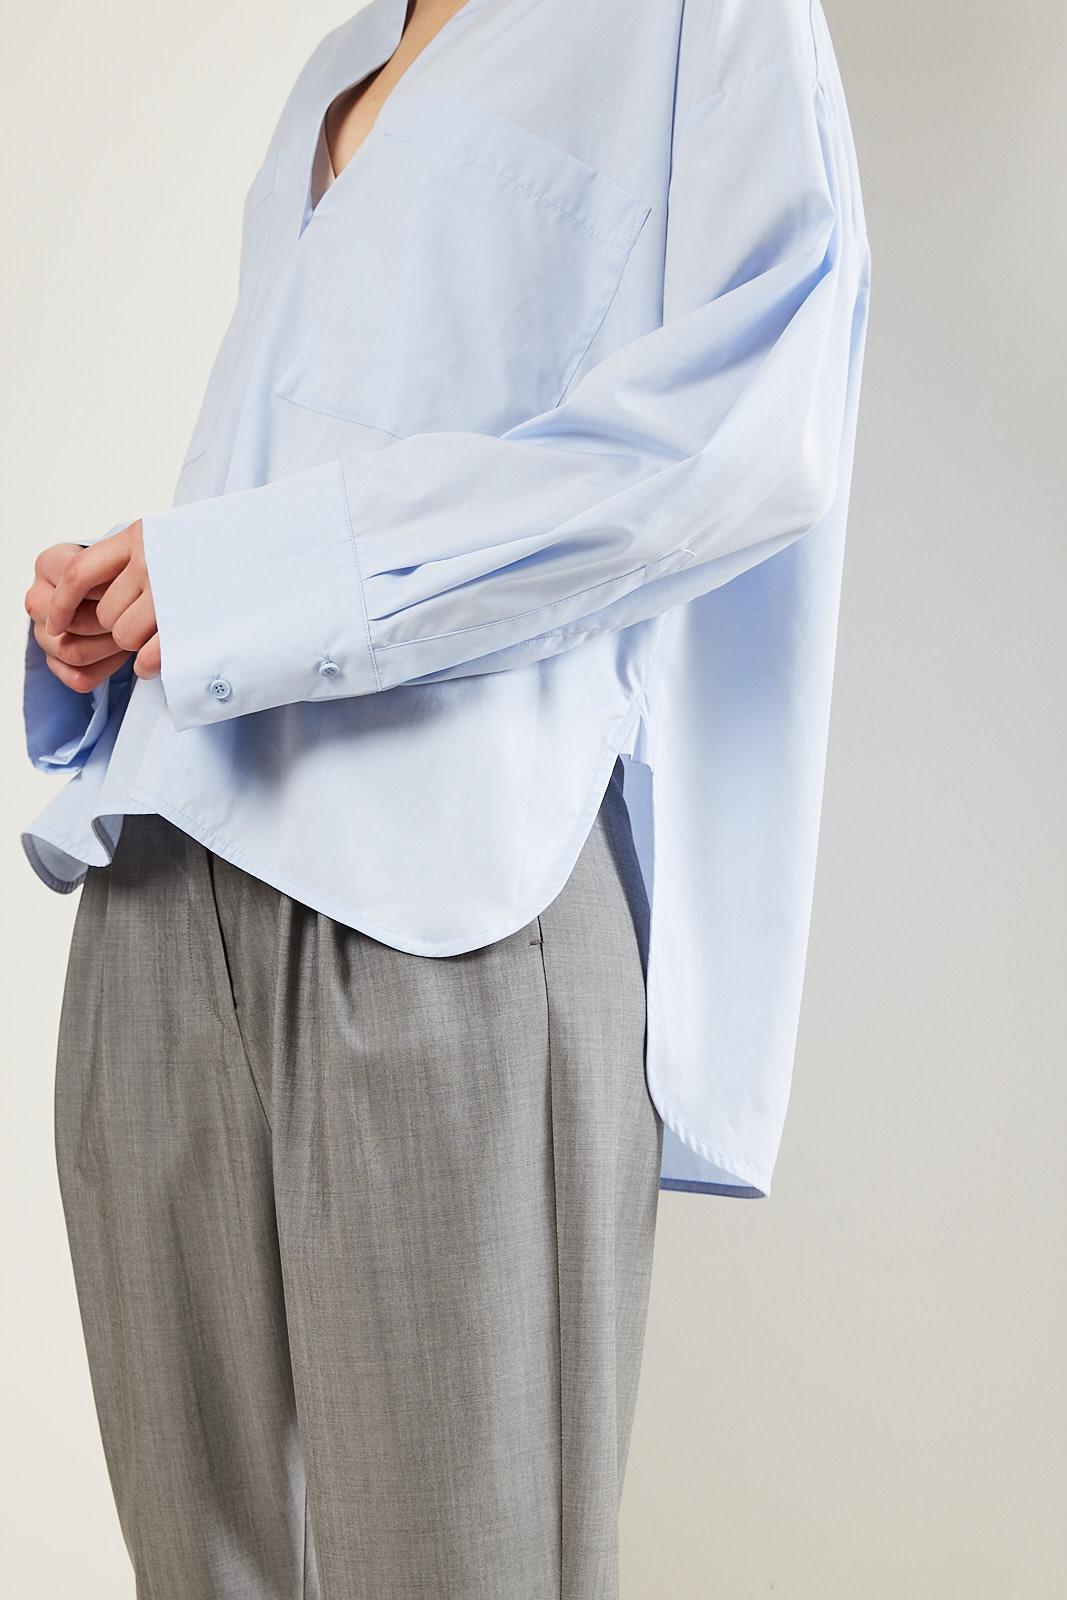 Christian Wijnants - Tashvi blouse